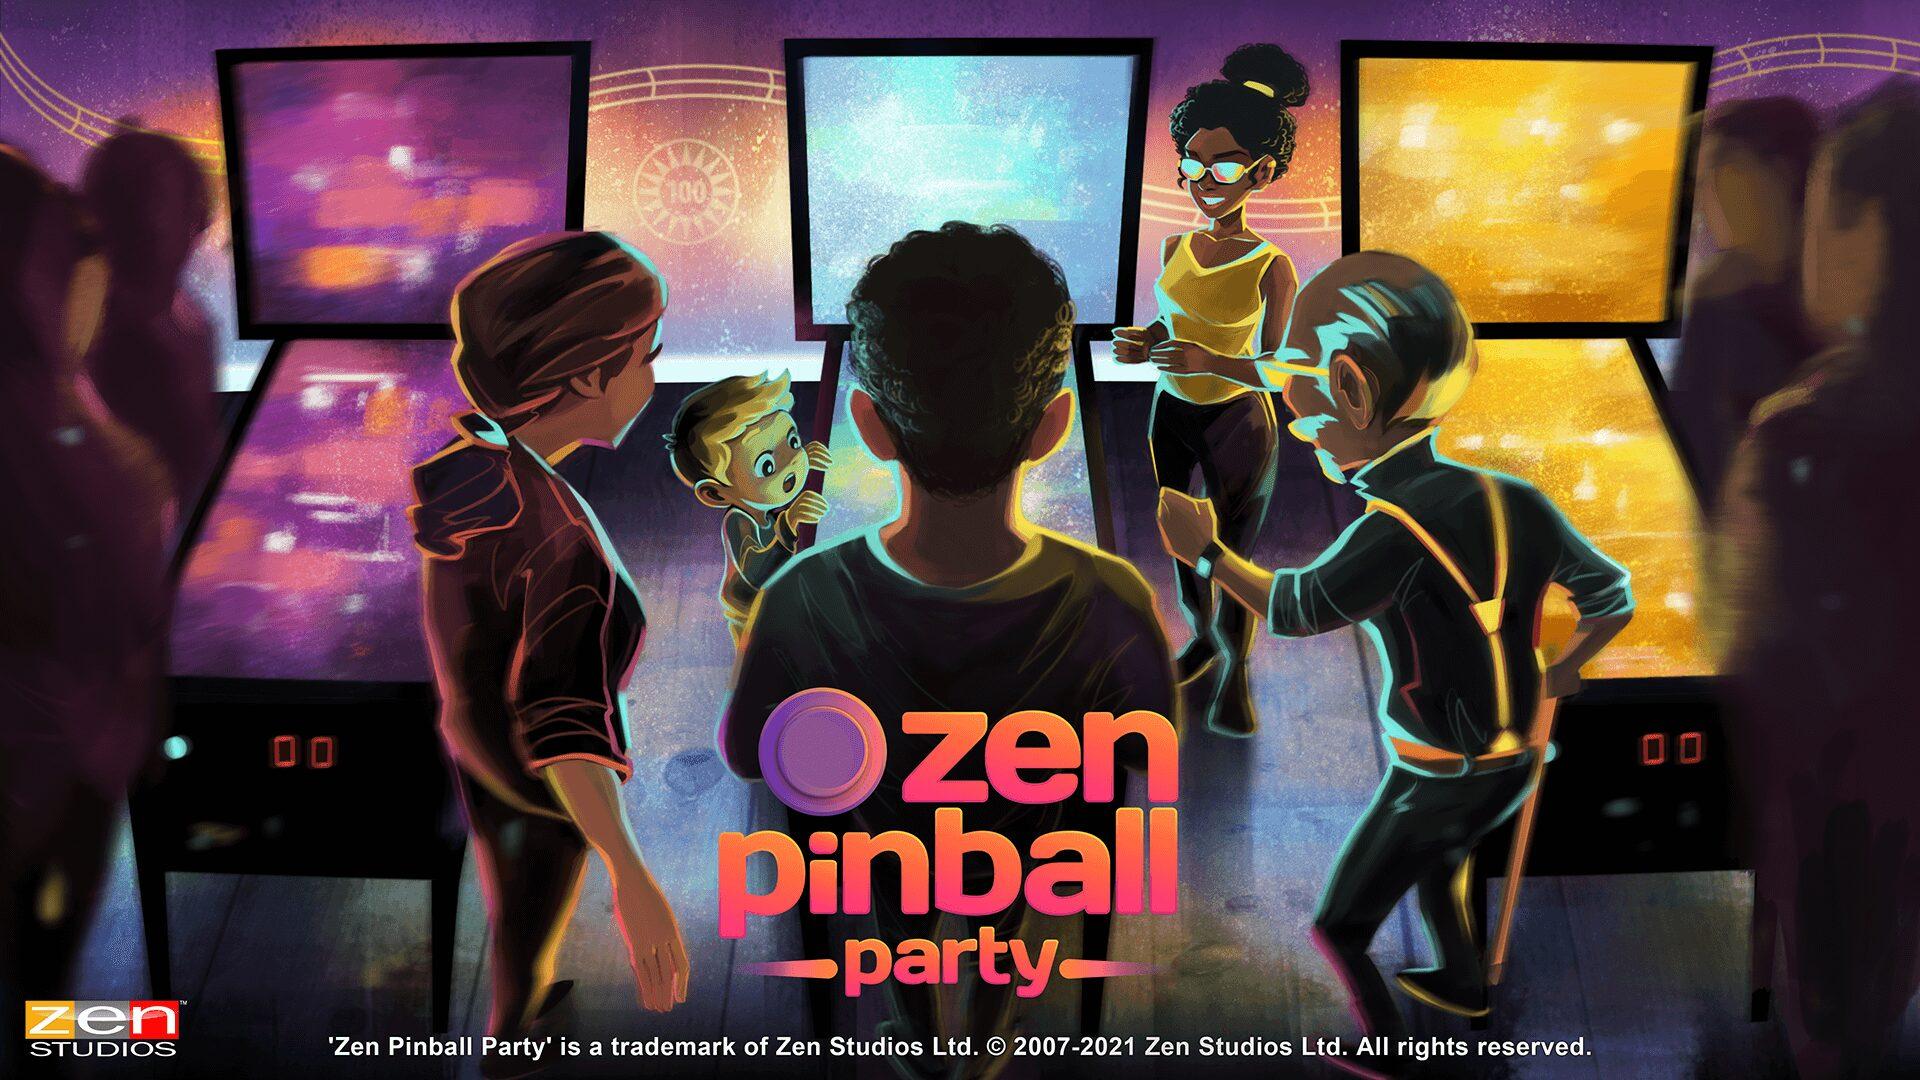 Zen Pinball Party impressions